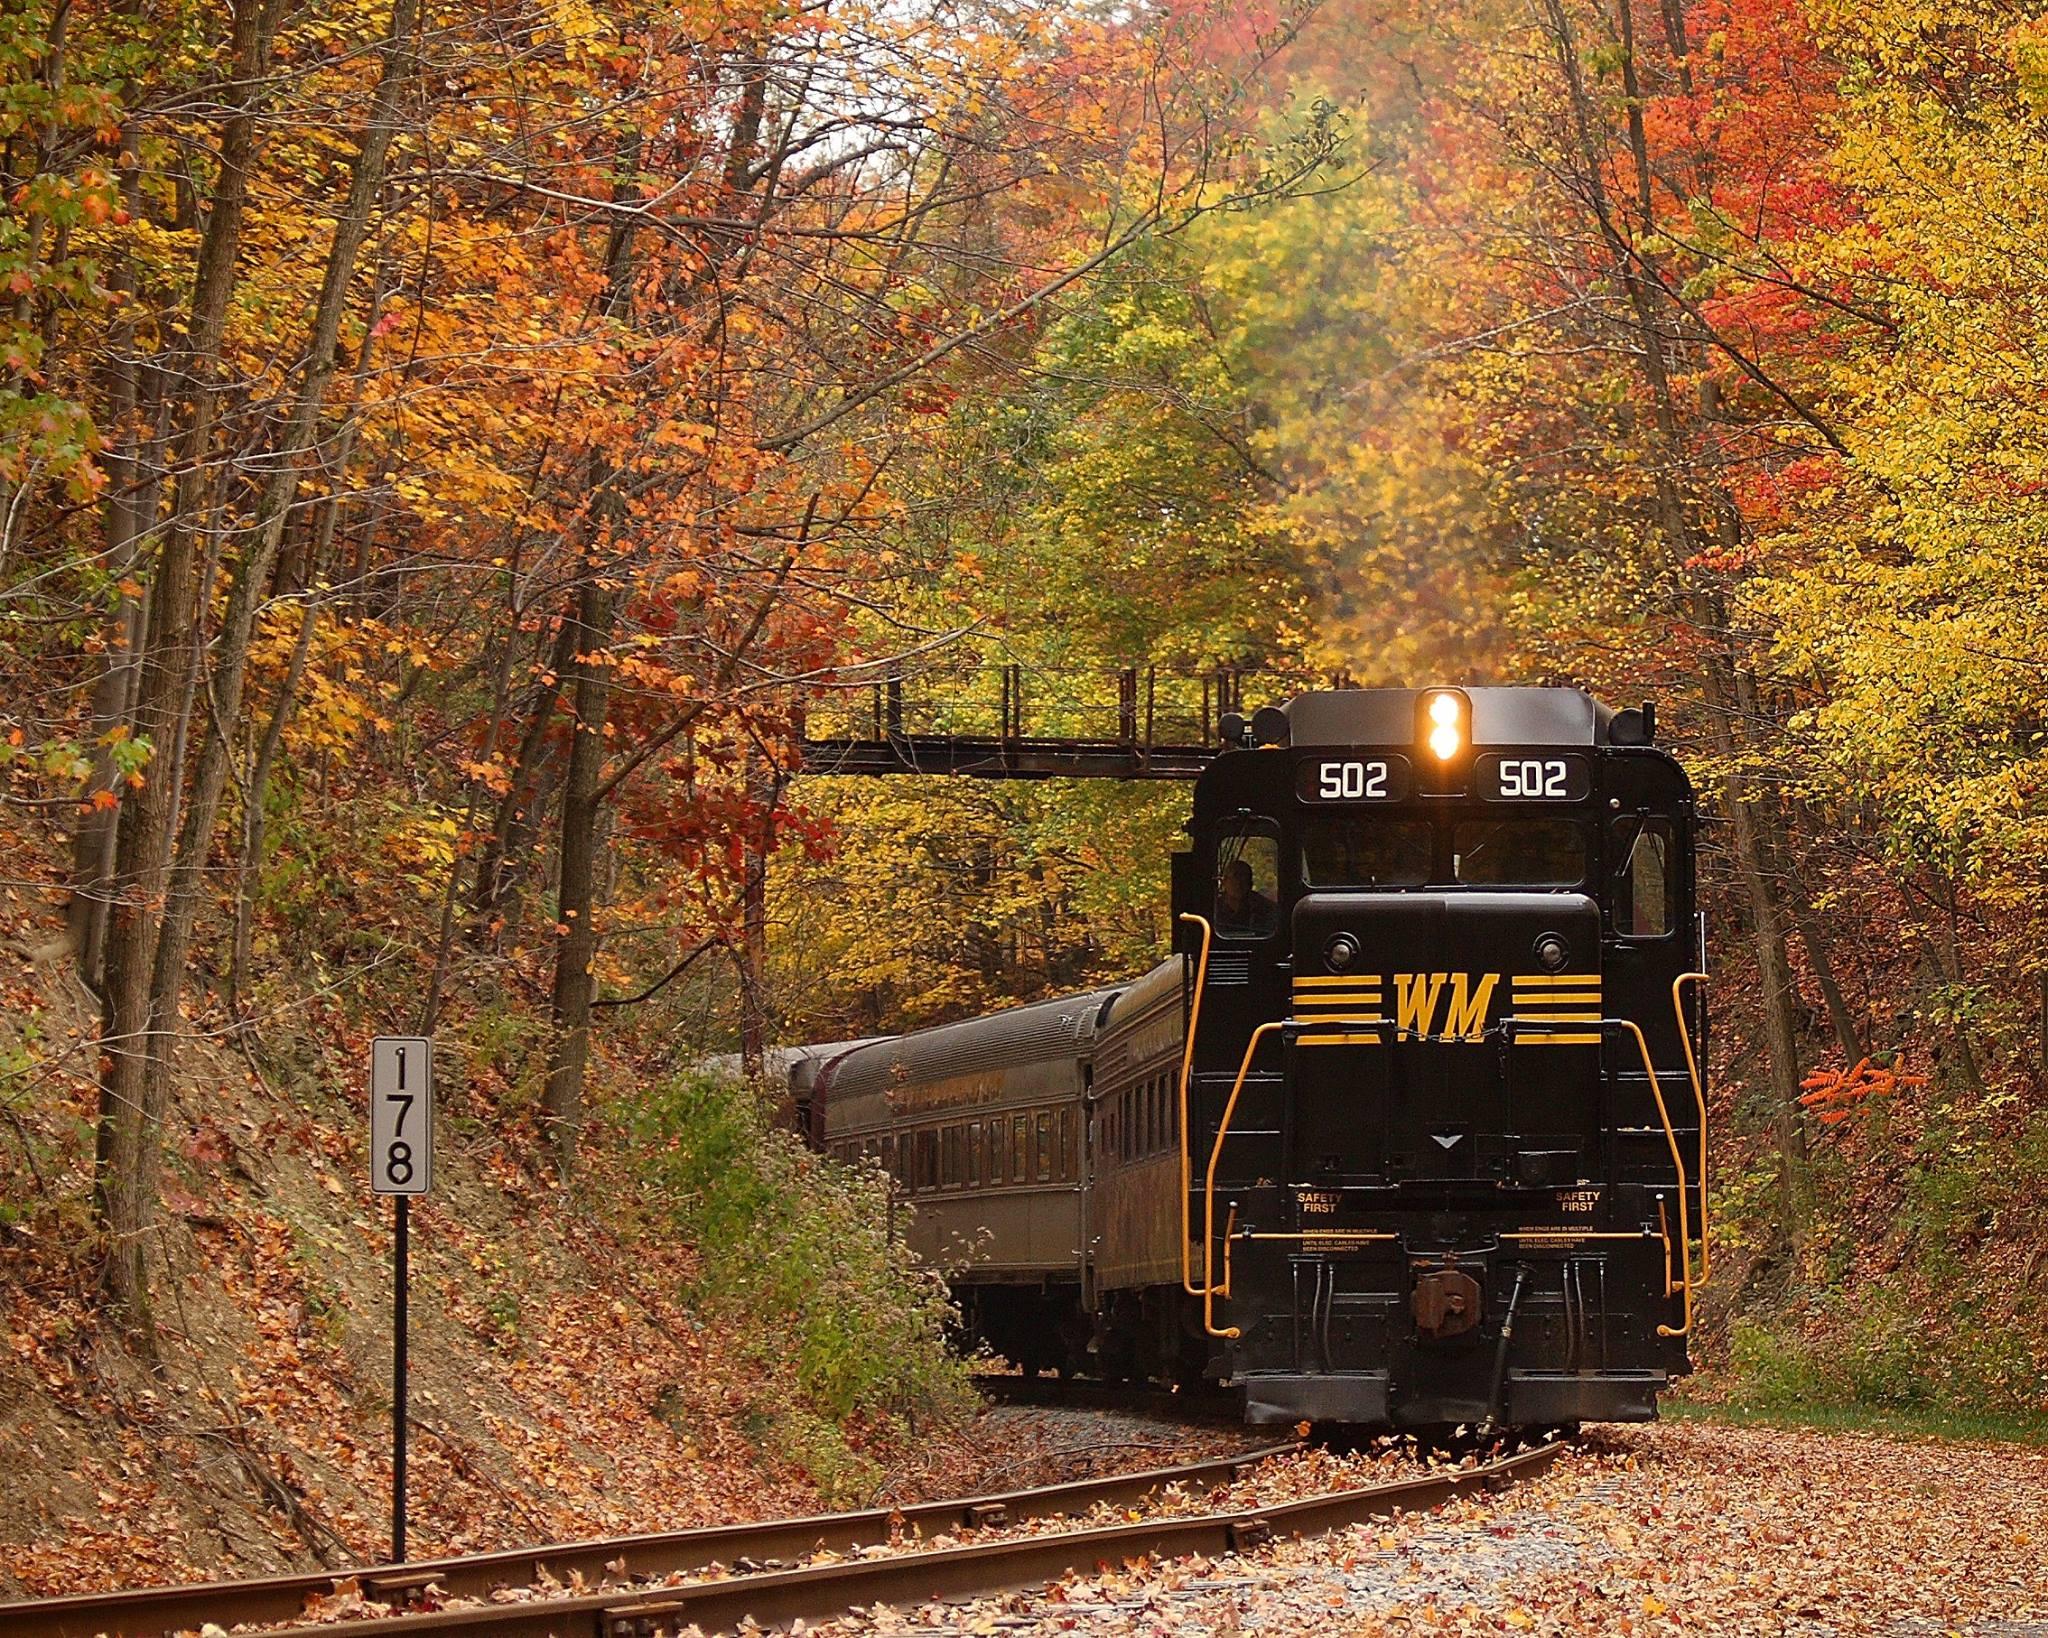 Boston In The Fall Wallpaper Take This Fall Foliage Train Ride Near Washington Dc